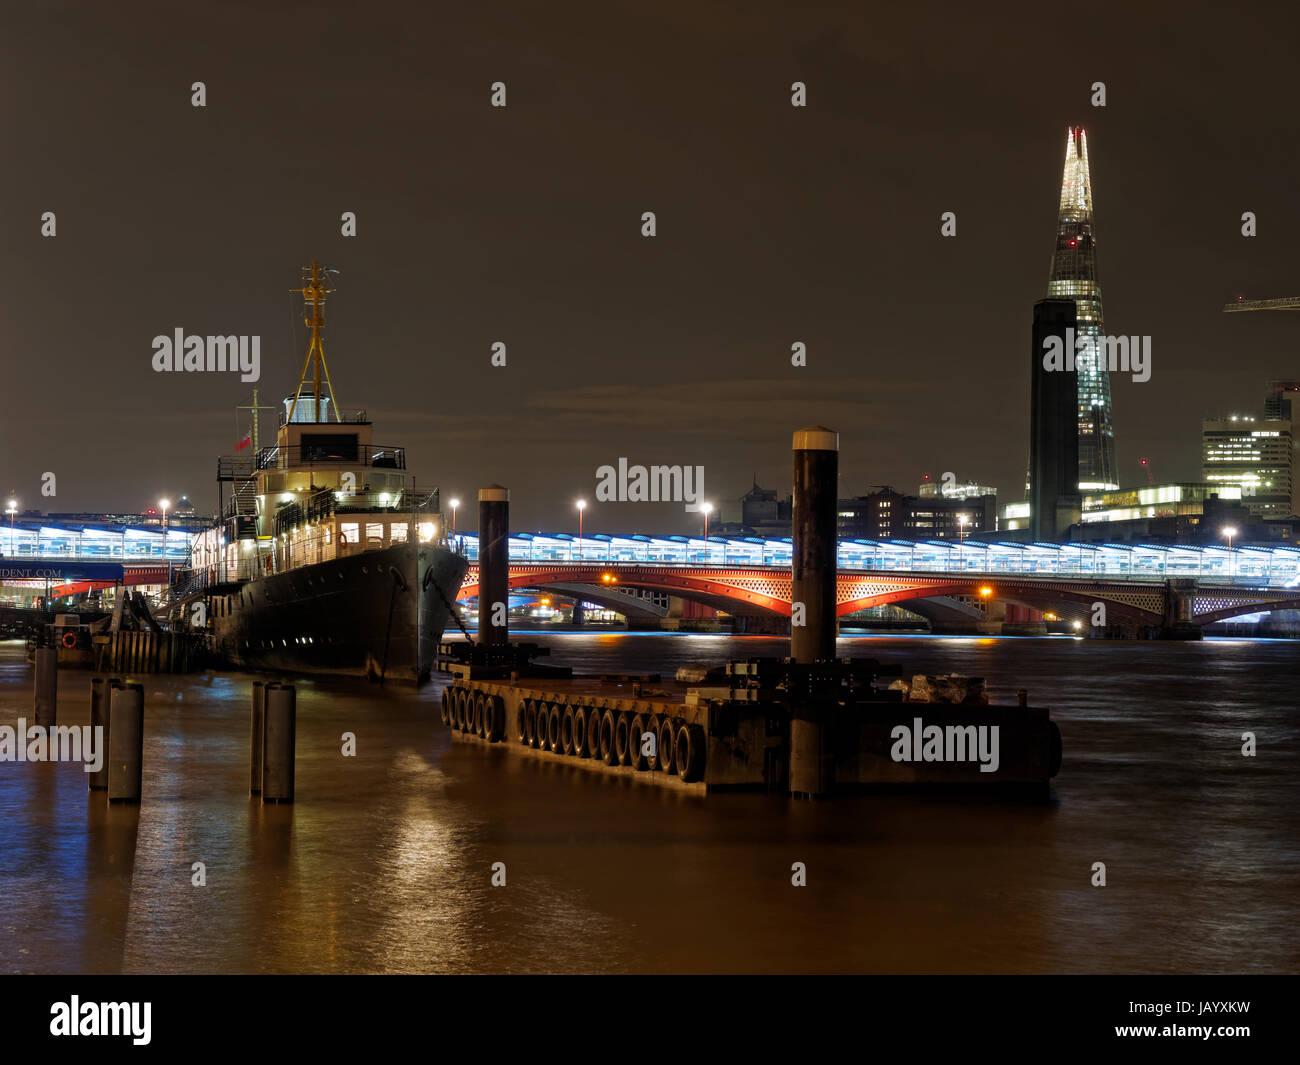 HMS President, London, december 2013 with Blackfriar bridge and the Shardin the background - Stock Image